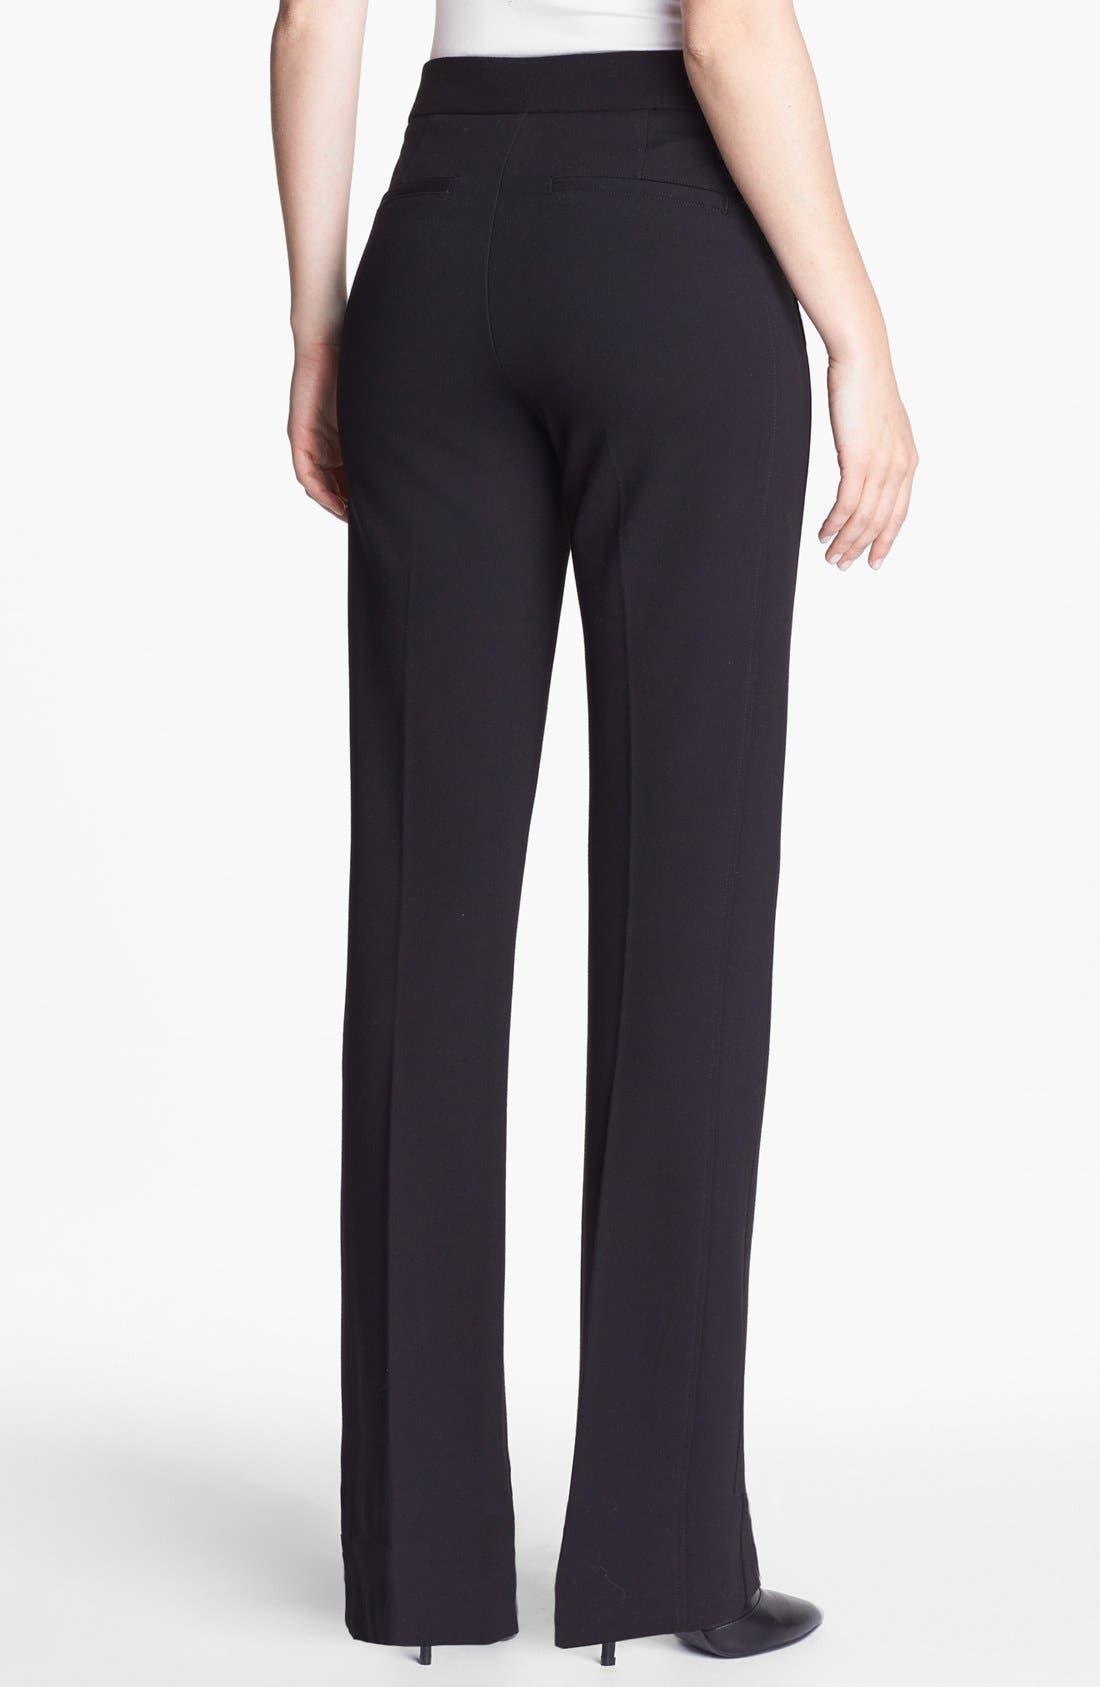 Alternate Image 3  - NYDJ Stretch Ponte Trousers (Regular & Petite)